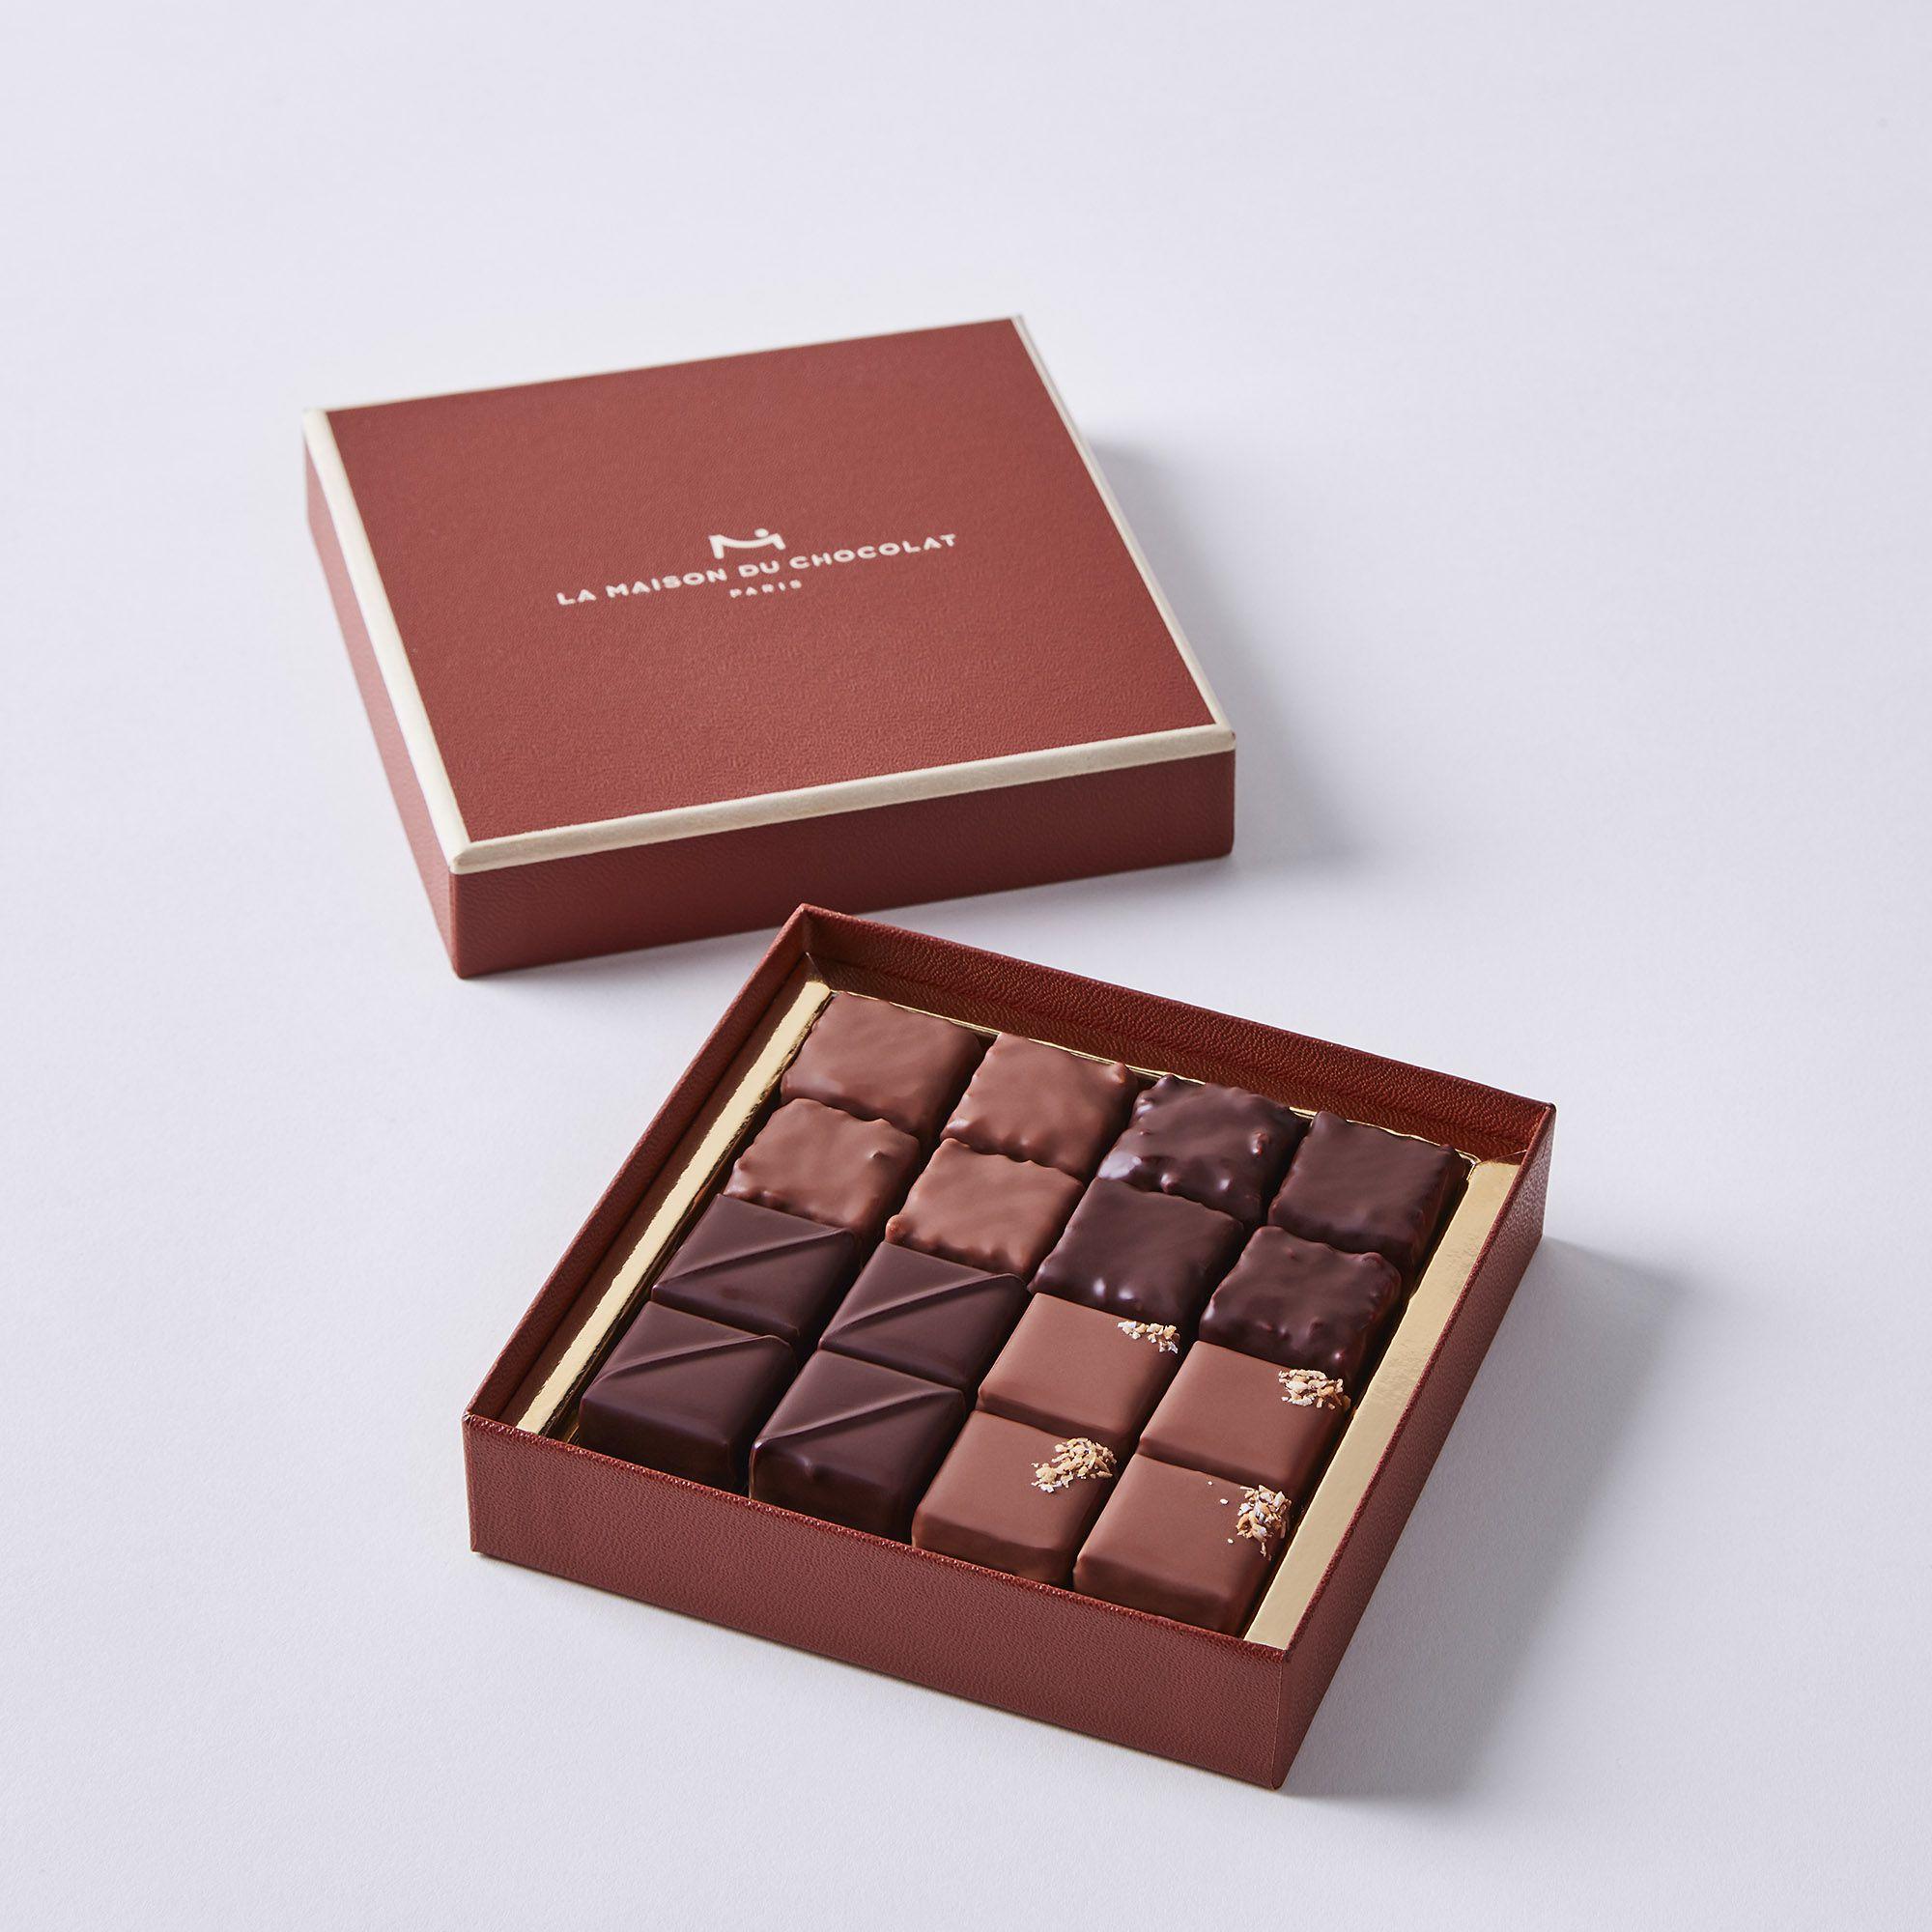 La Maison du Chocolat Praline Gift Box - 16-Piece